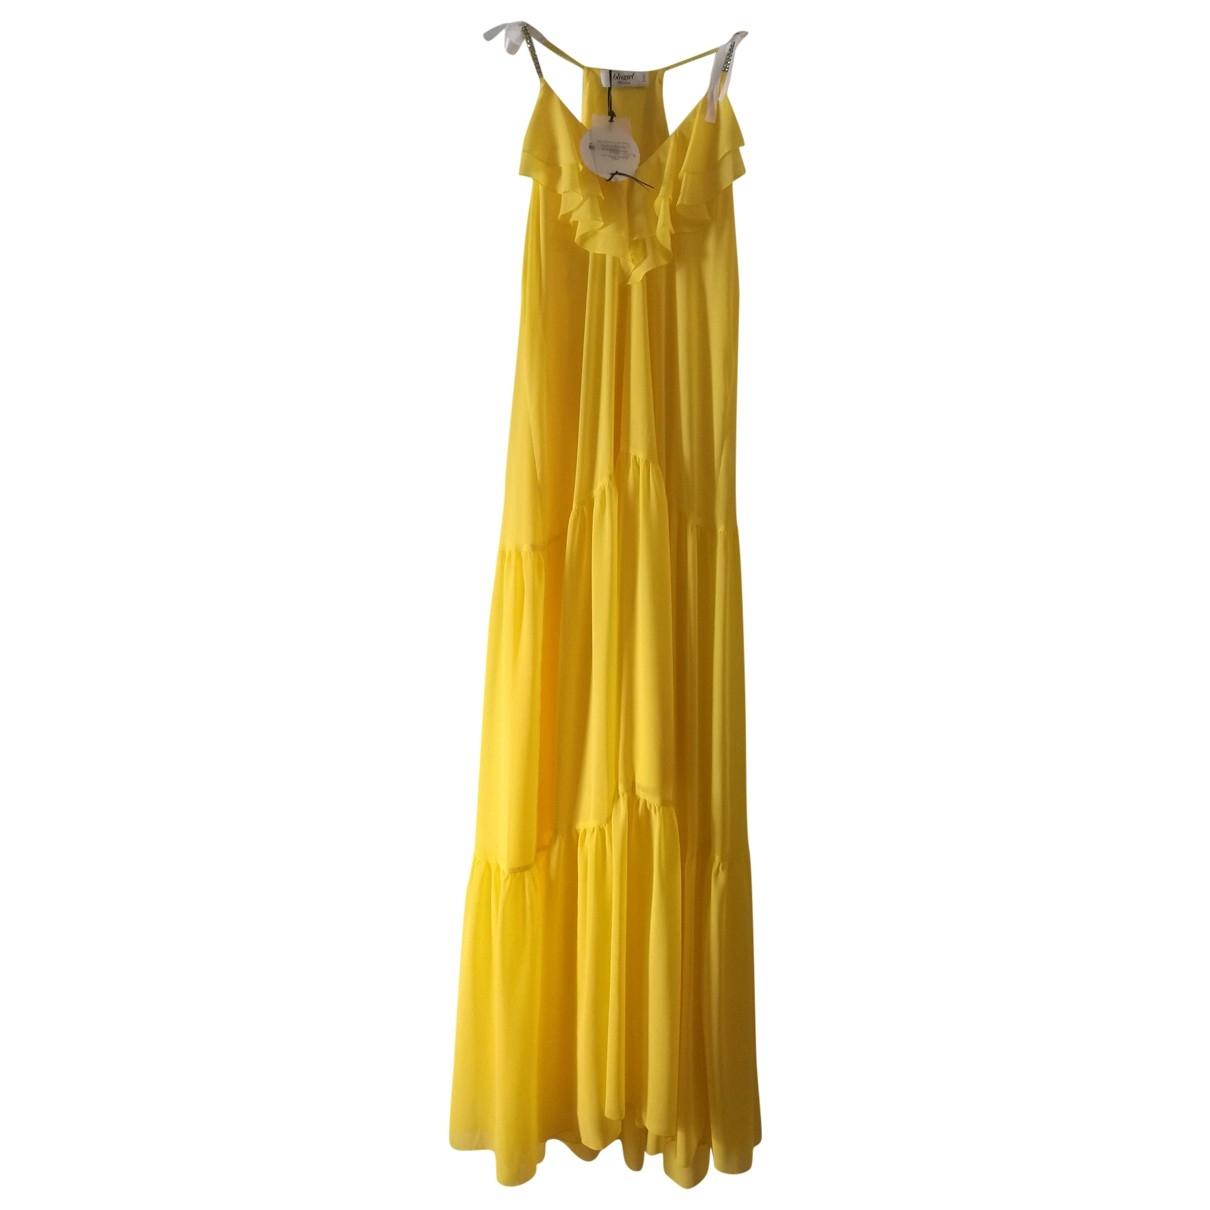 Blumarine \N Yellow dress for Women 42 IT